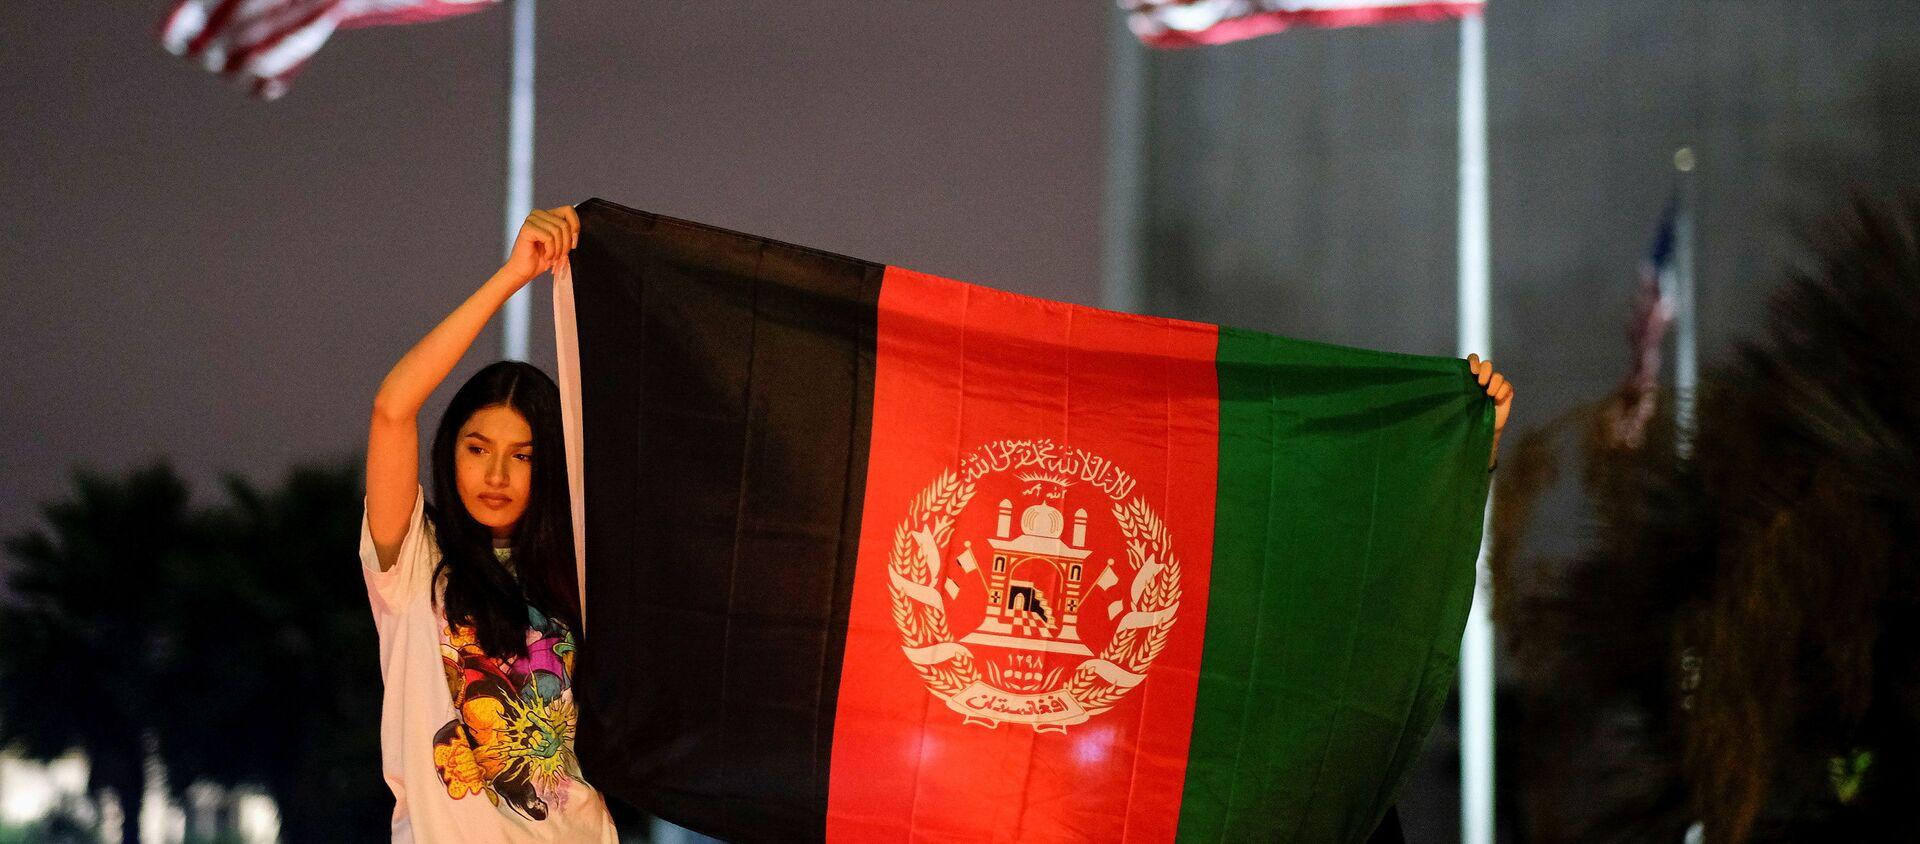 People holding an Afghan flag attend a vigil for Afghanistan outside the West LA Federal Building in Los Angeles, California, U.S. August 17, 2021 - Sputnik International, 1920, 27.08.2021